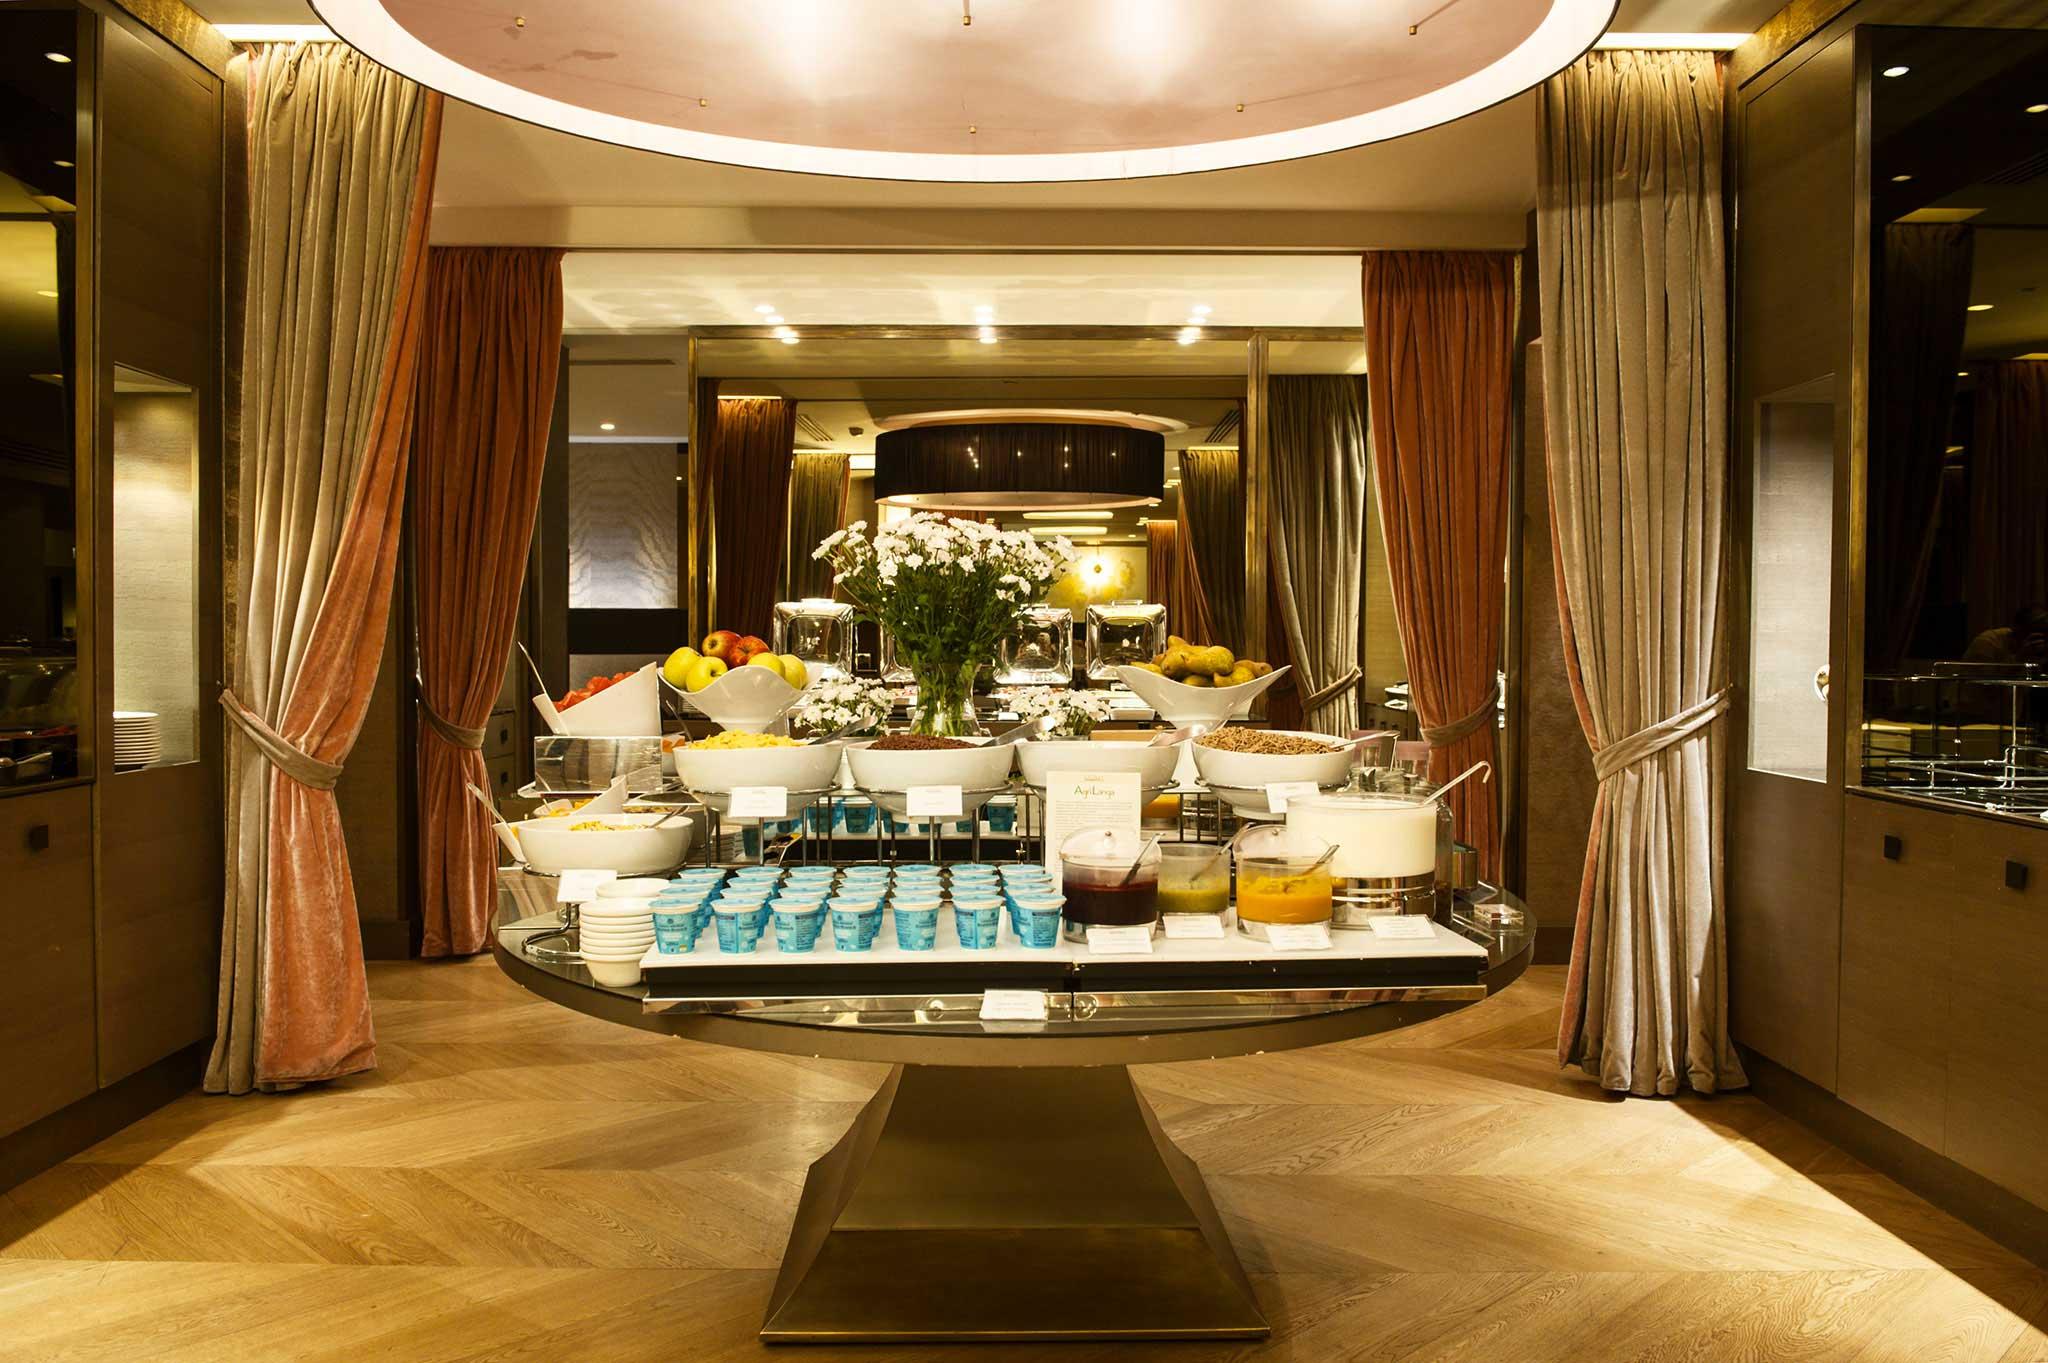 Star Hotel Rosa Milano Via Pattari